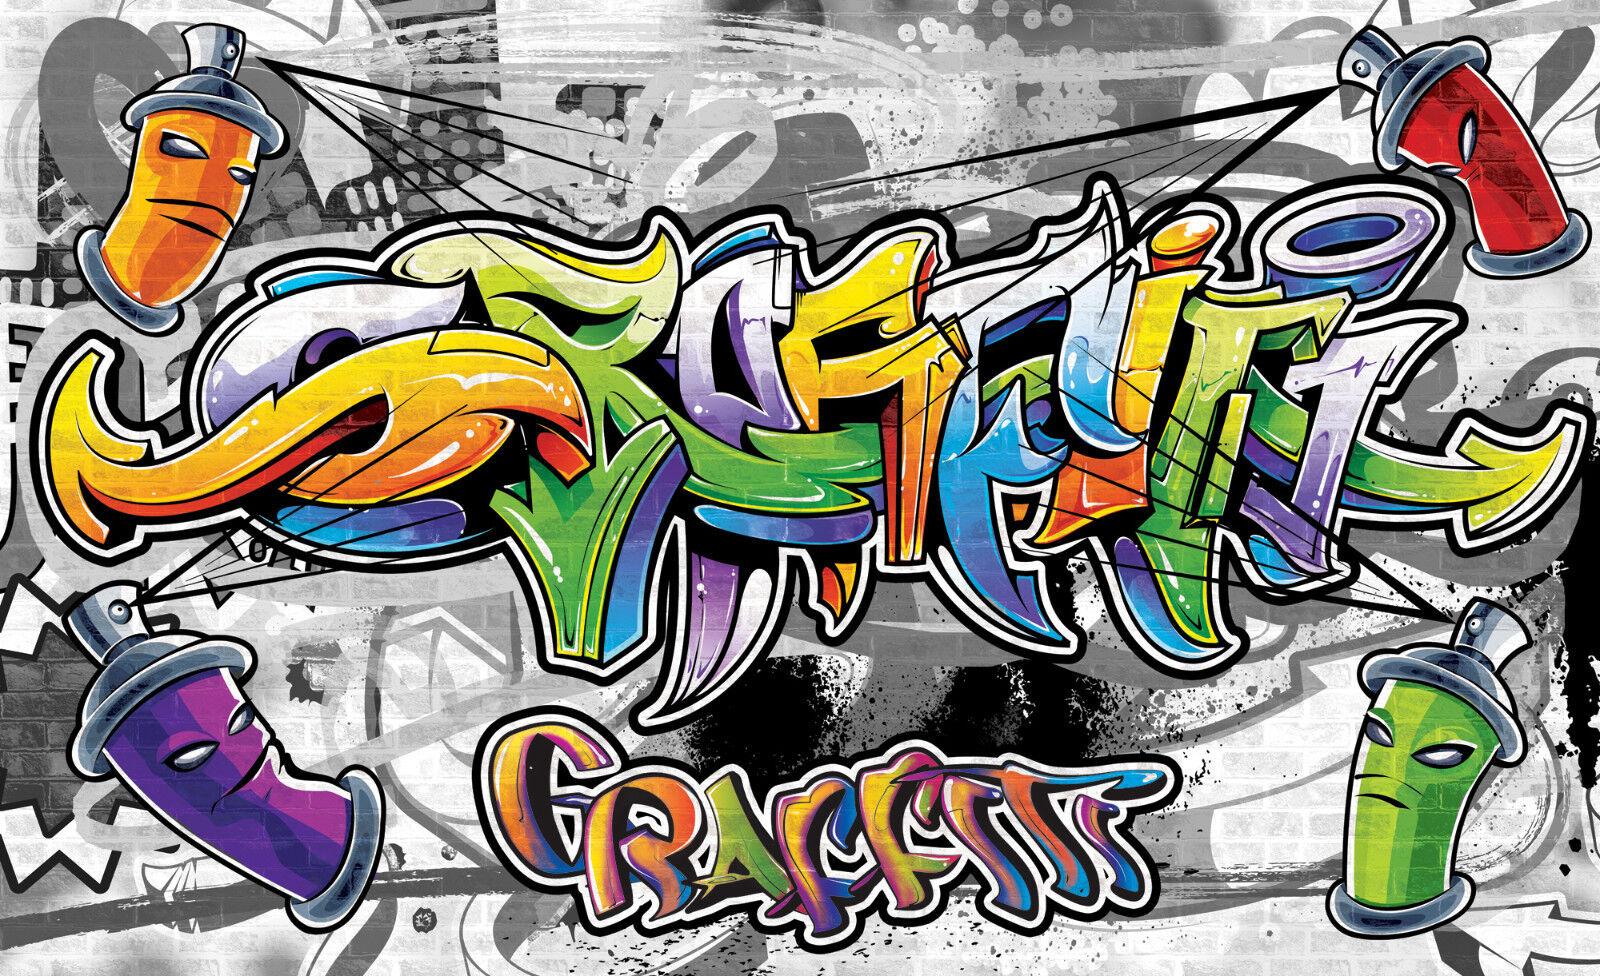 VLIES Fototapete-GRAFFITI-(2295)-Straßen-Kunst Design Deco Street-Art Abstrakt